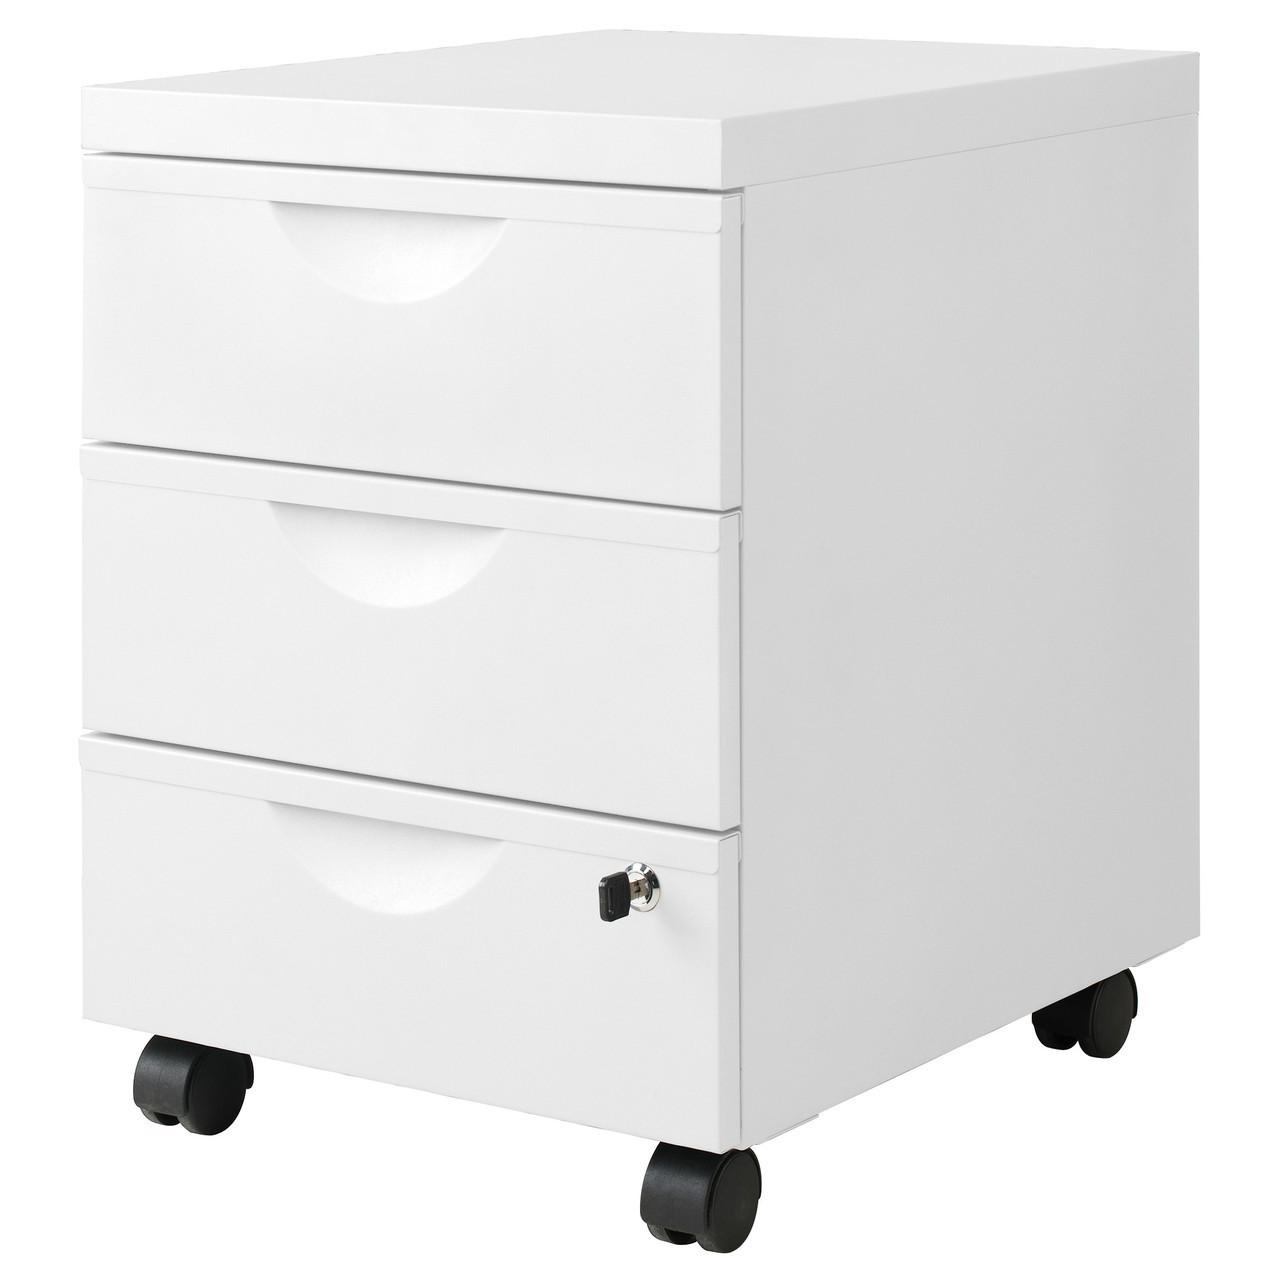 Тумба на колесиках ERIK с 3 ящиками, белая, IKEA, 101.518.09